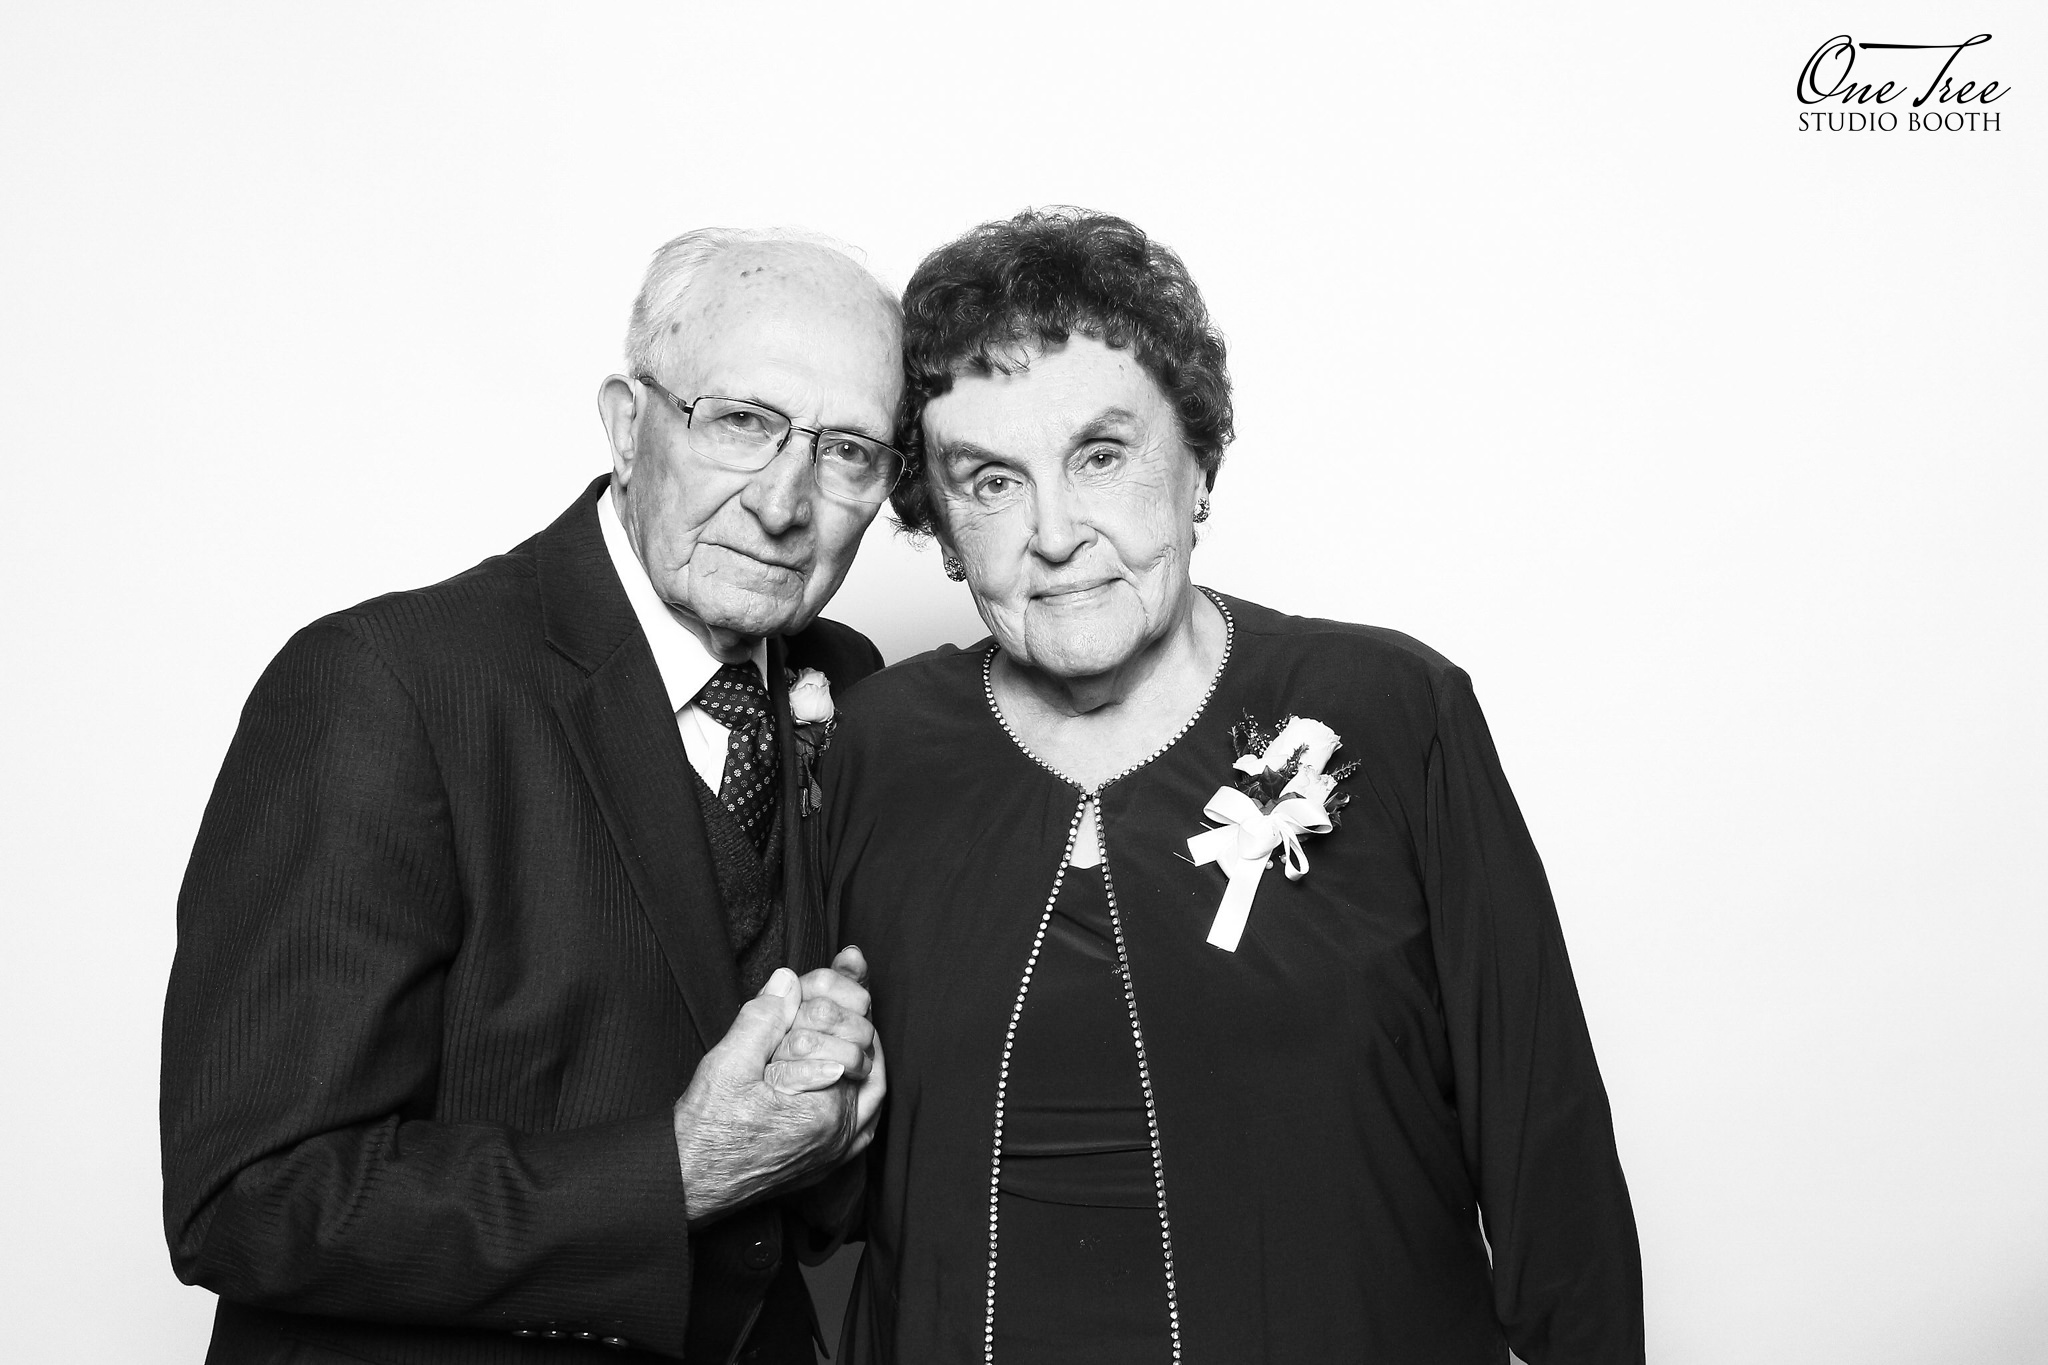 Wedding Photo Booth at Inn on the Twenty